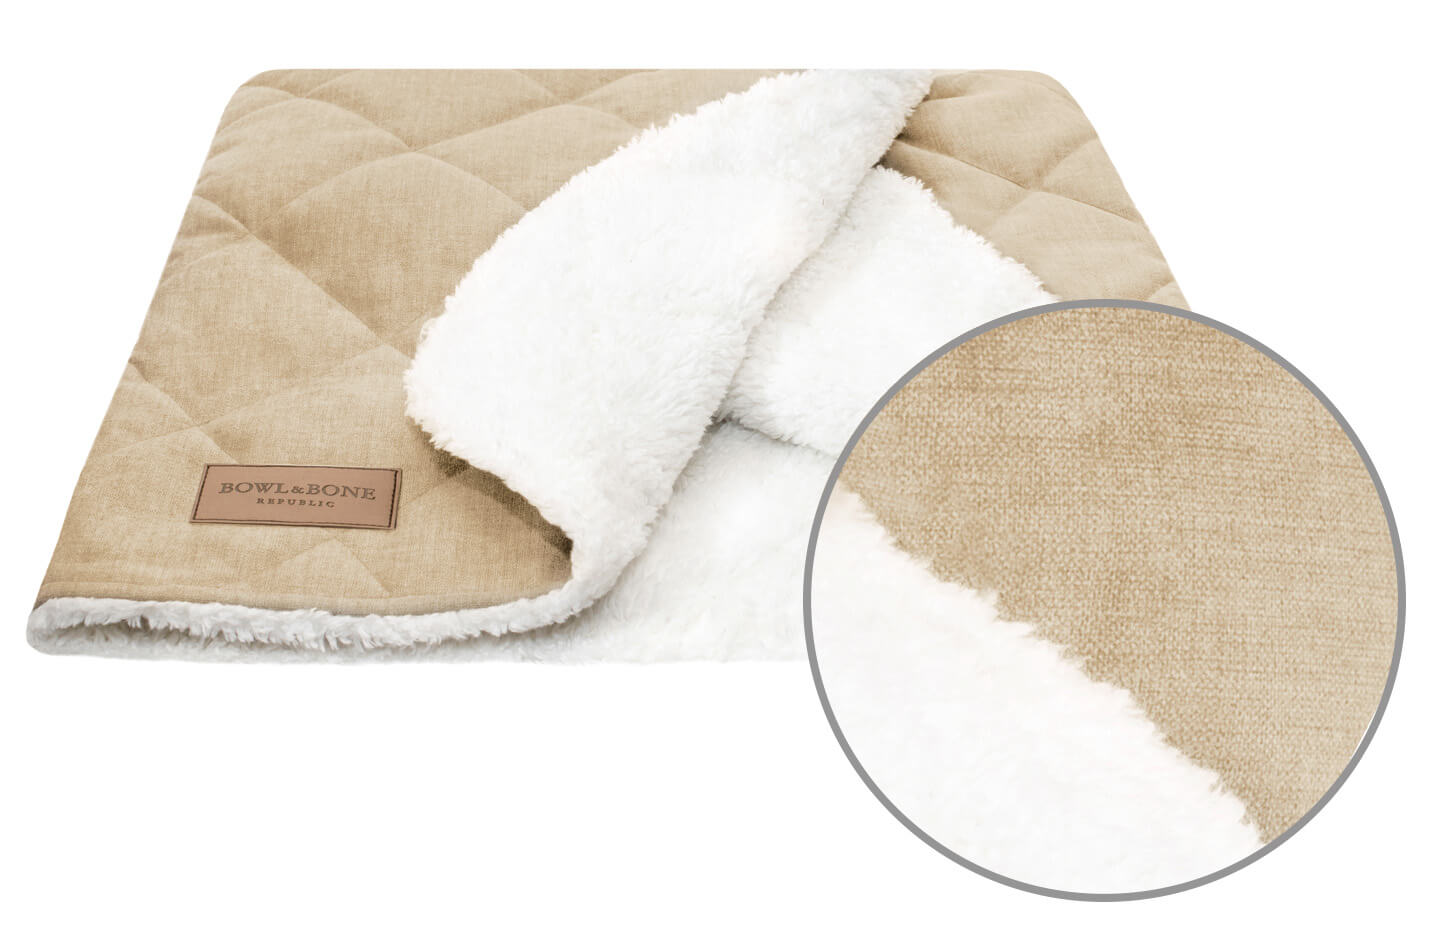 dog bed dreamy cream bowlandbonerepublic magnifier